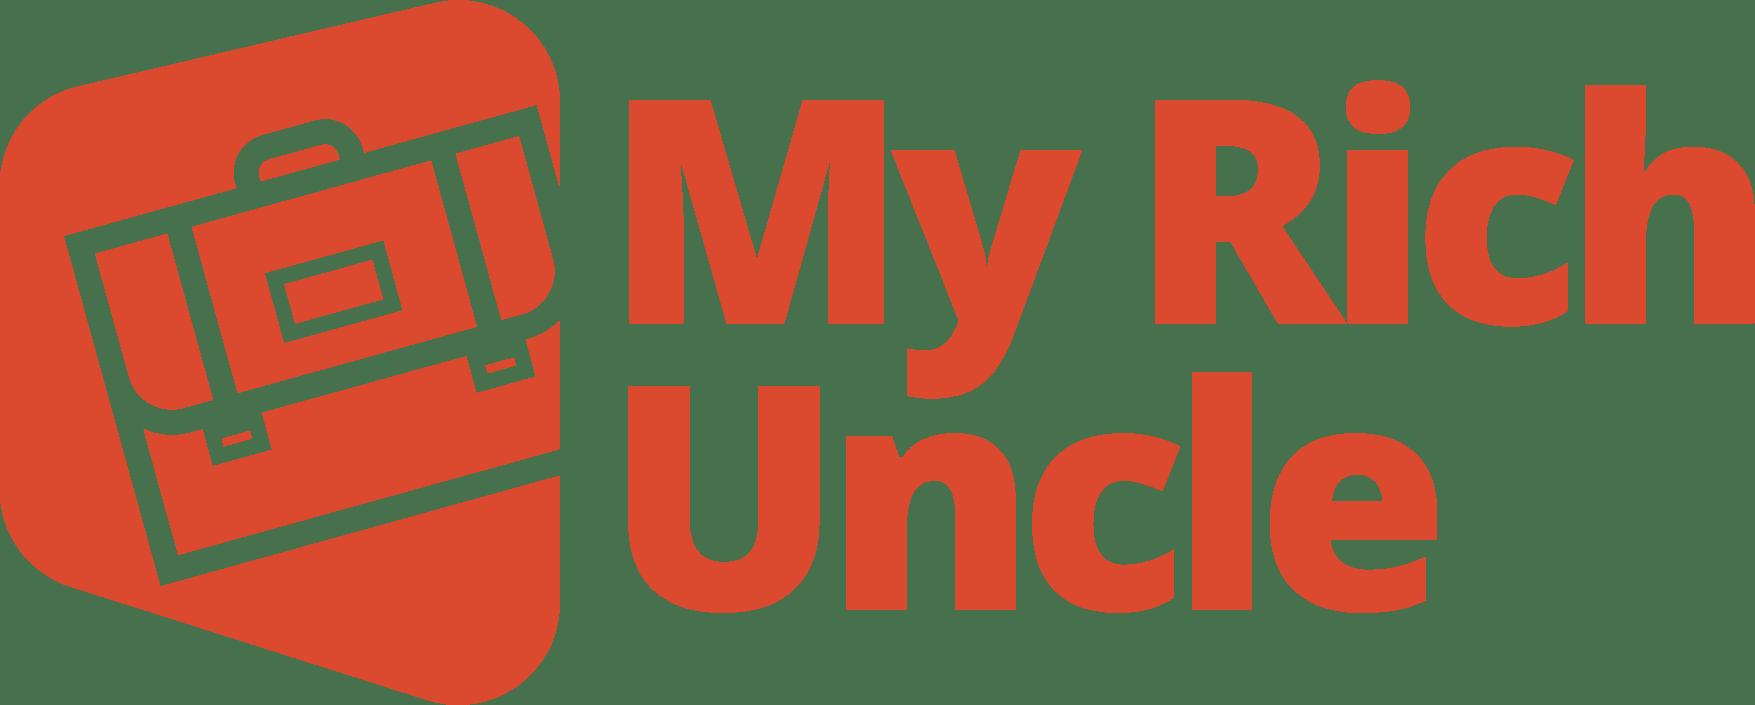 My Rich Uncle Team Building Event Logo